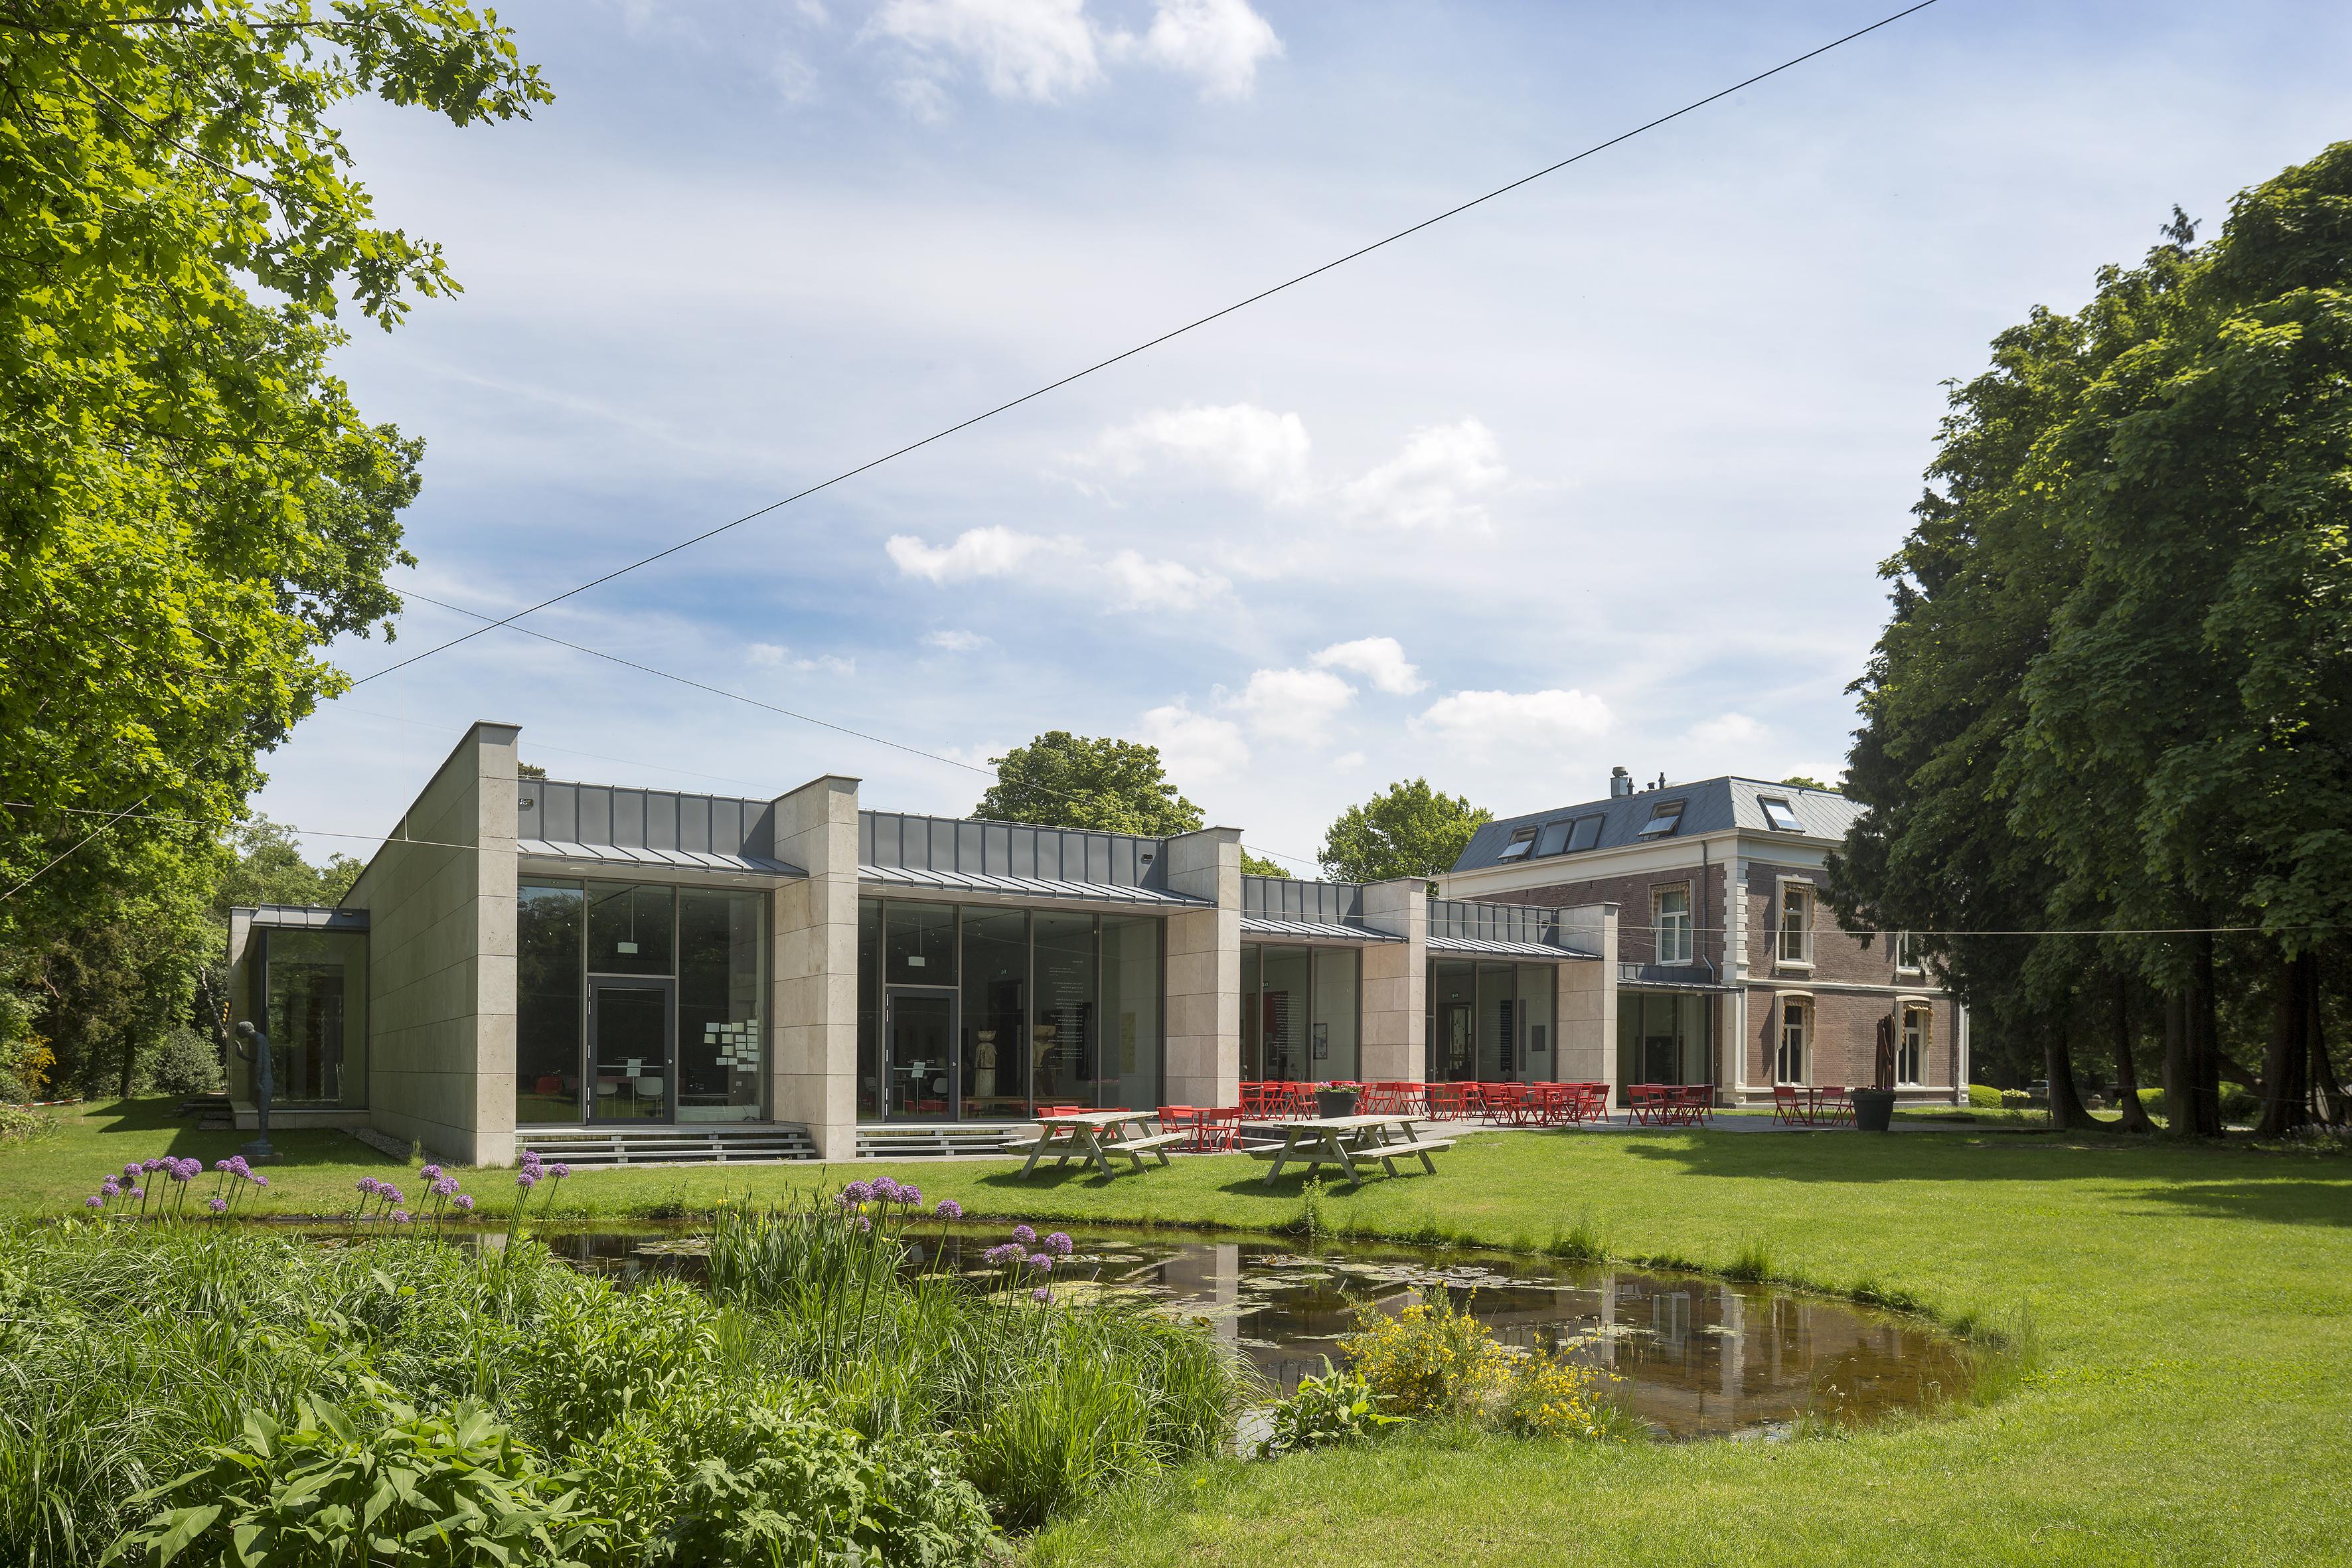 De tuin van Museum Kranenburgh. (Foto: Luuk Kramer)